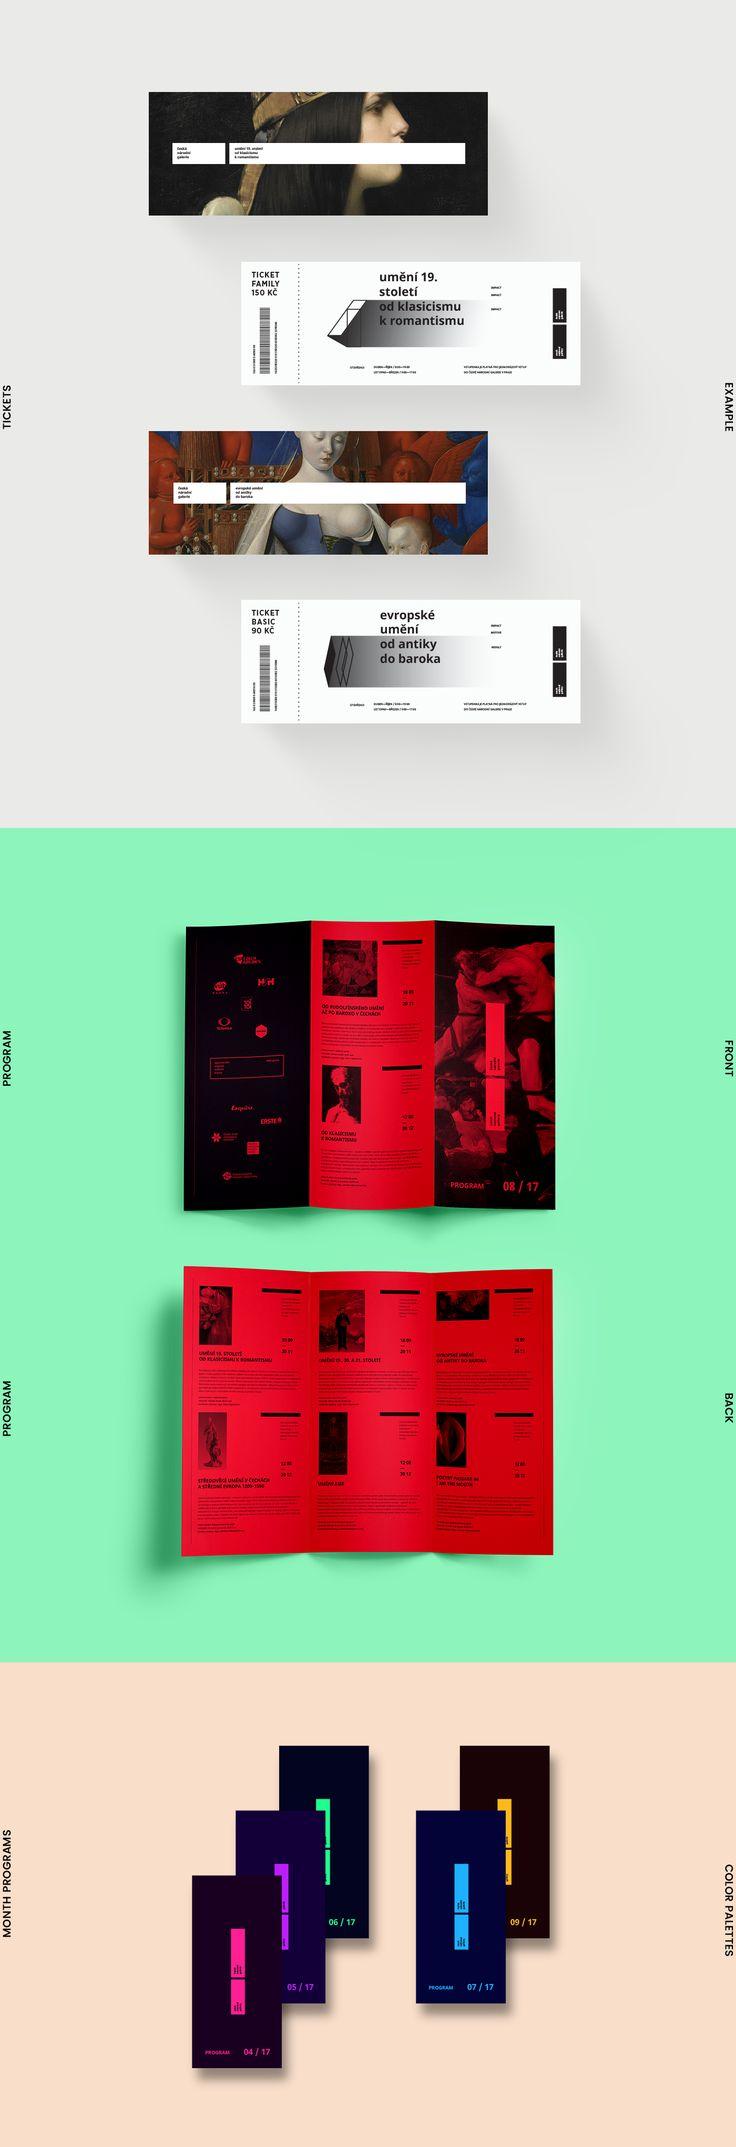 Czech National Gallery—Visual Identity on Behance